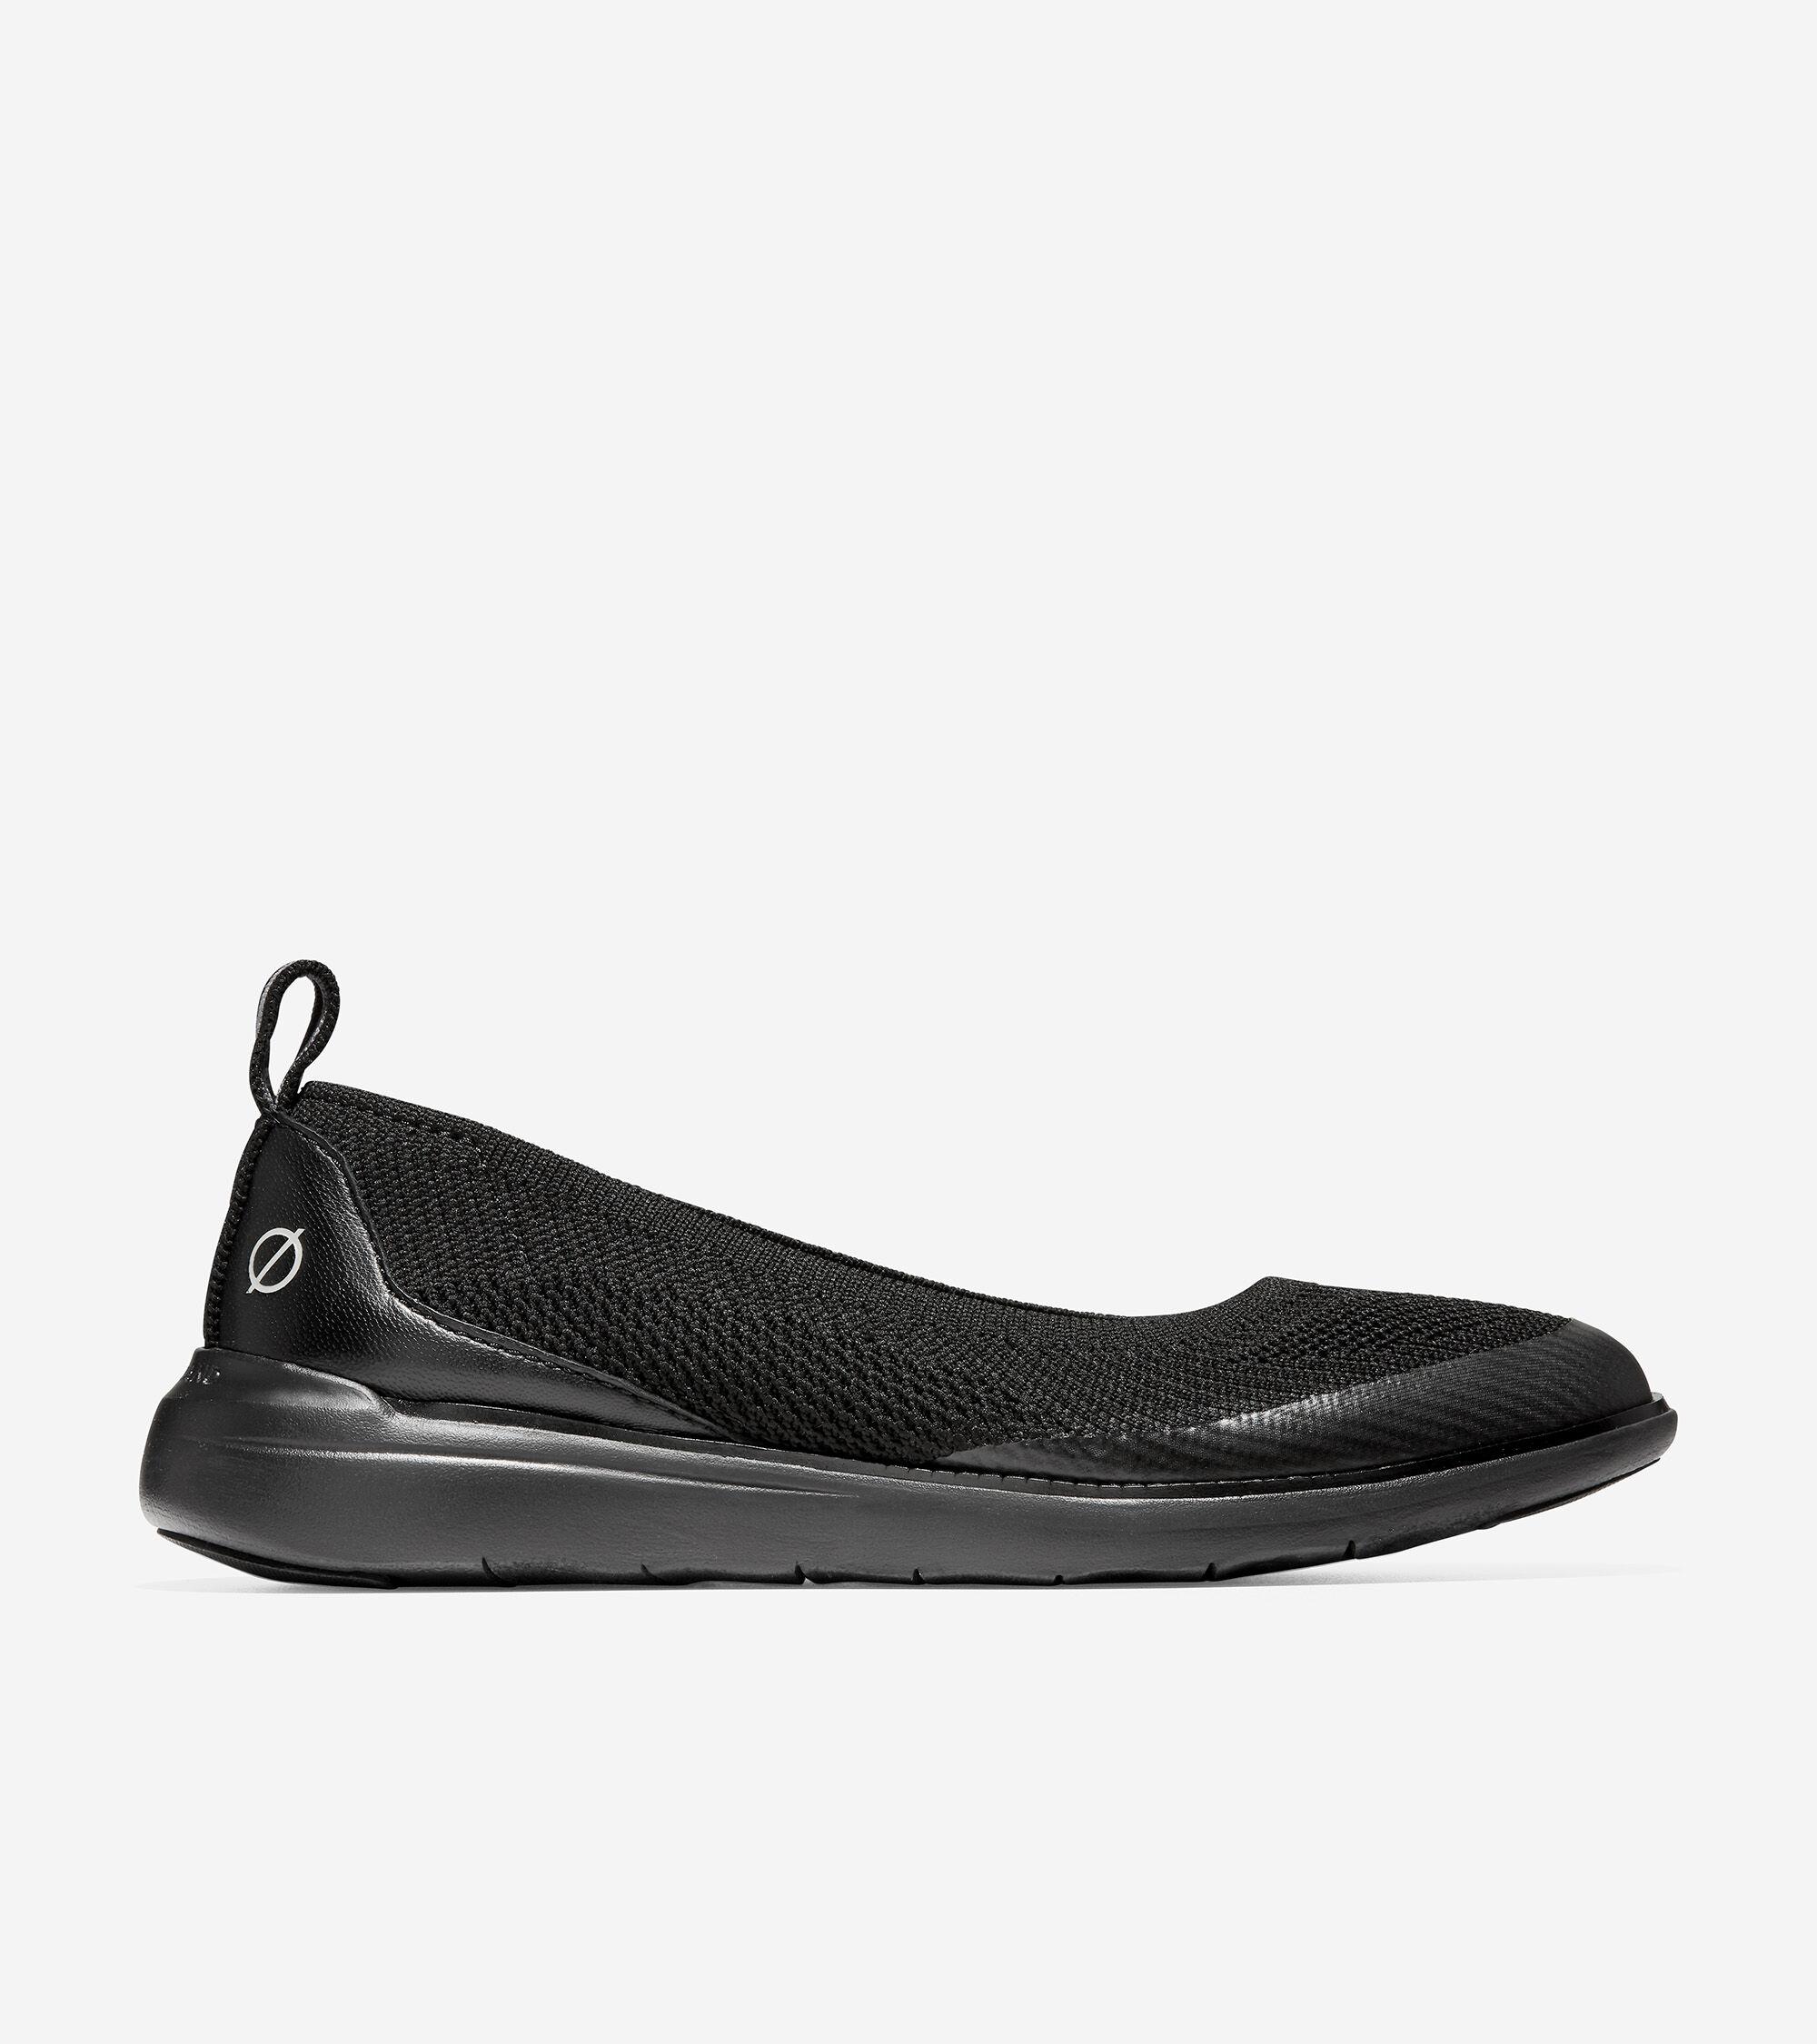 Flats, Ballet Flats \u0026 Skimmers | Cole Haan